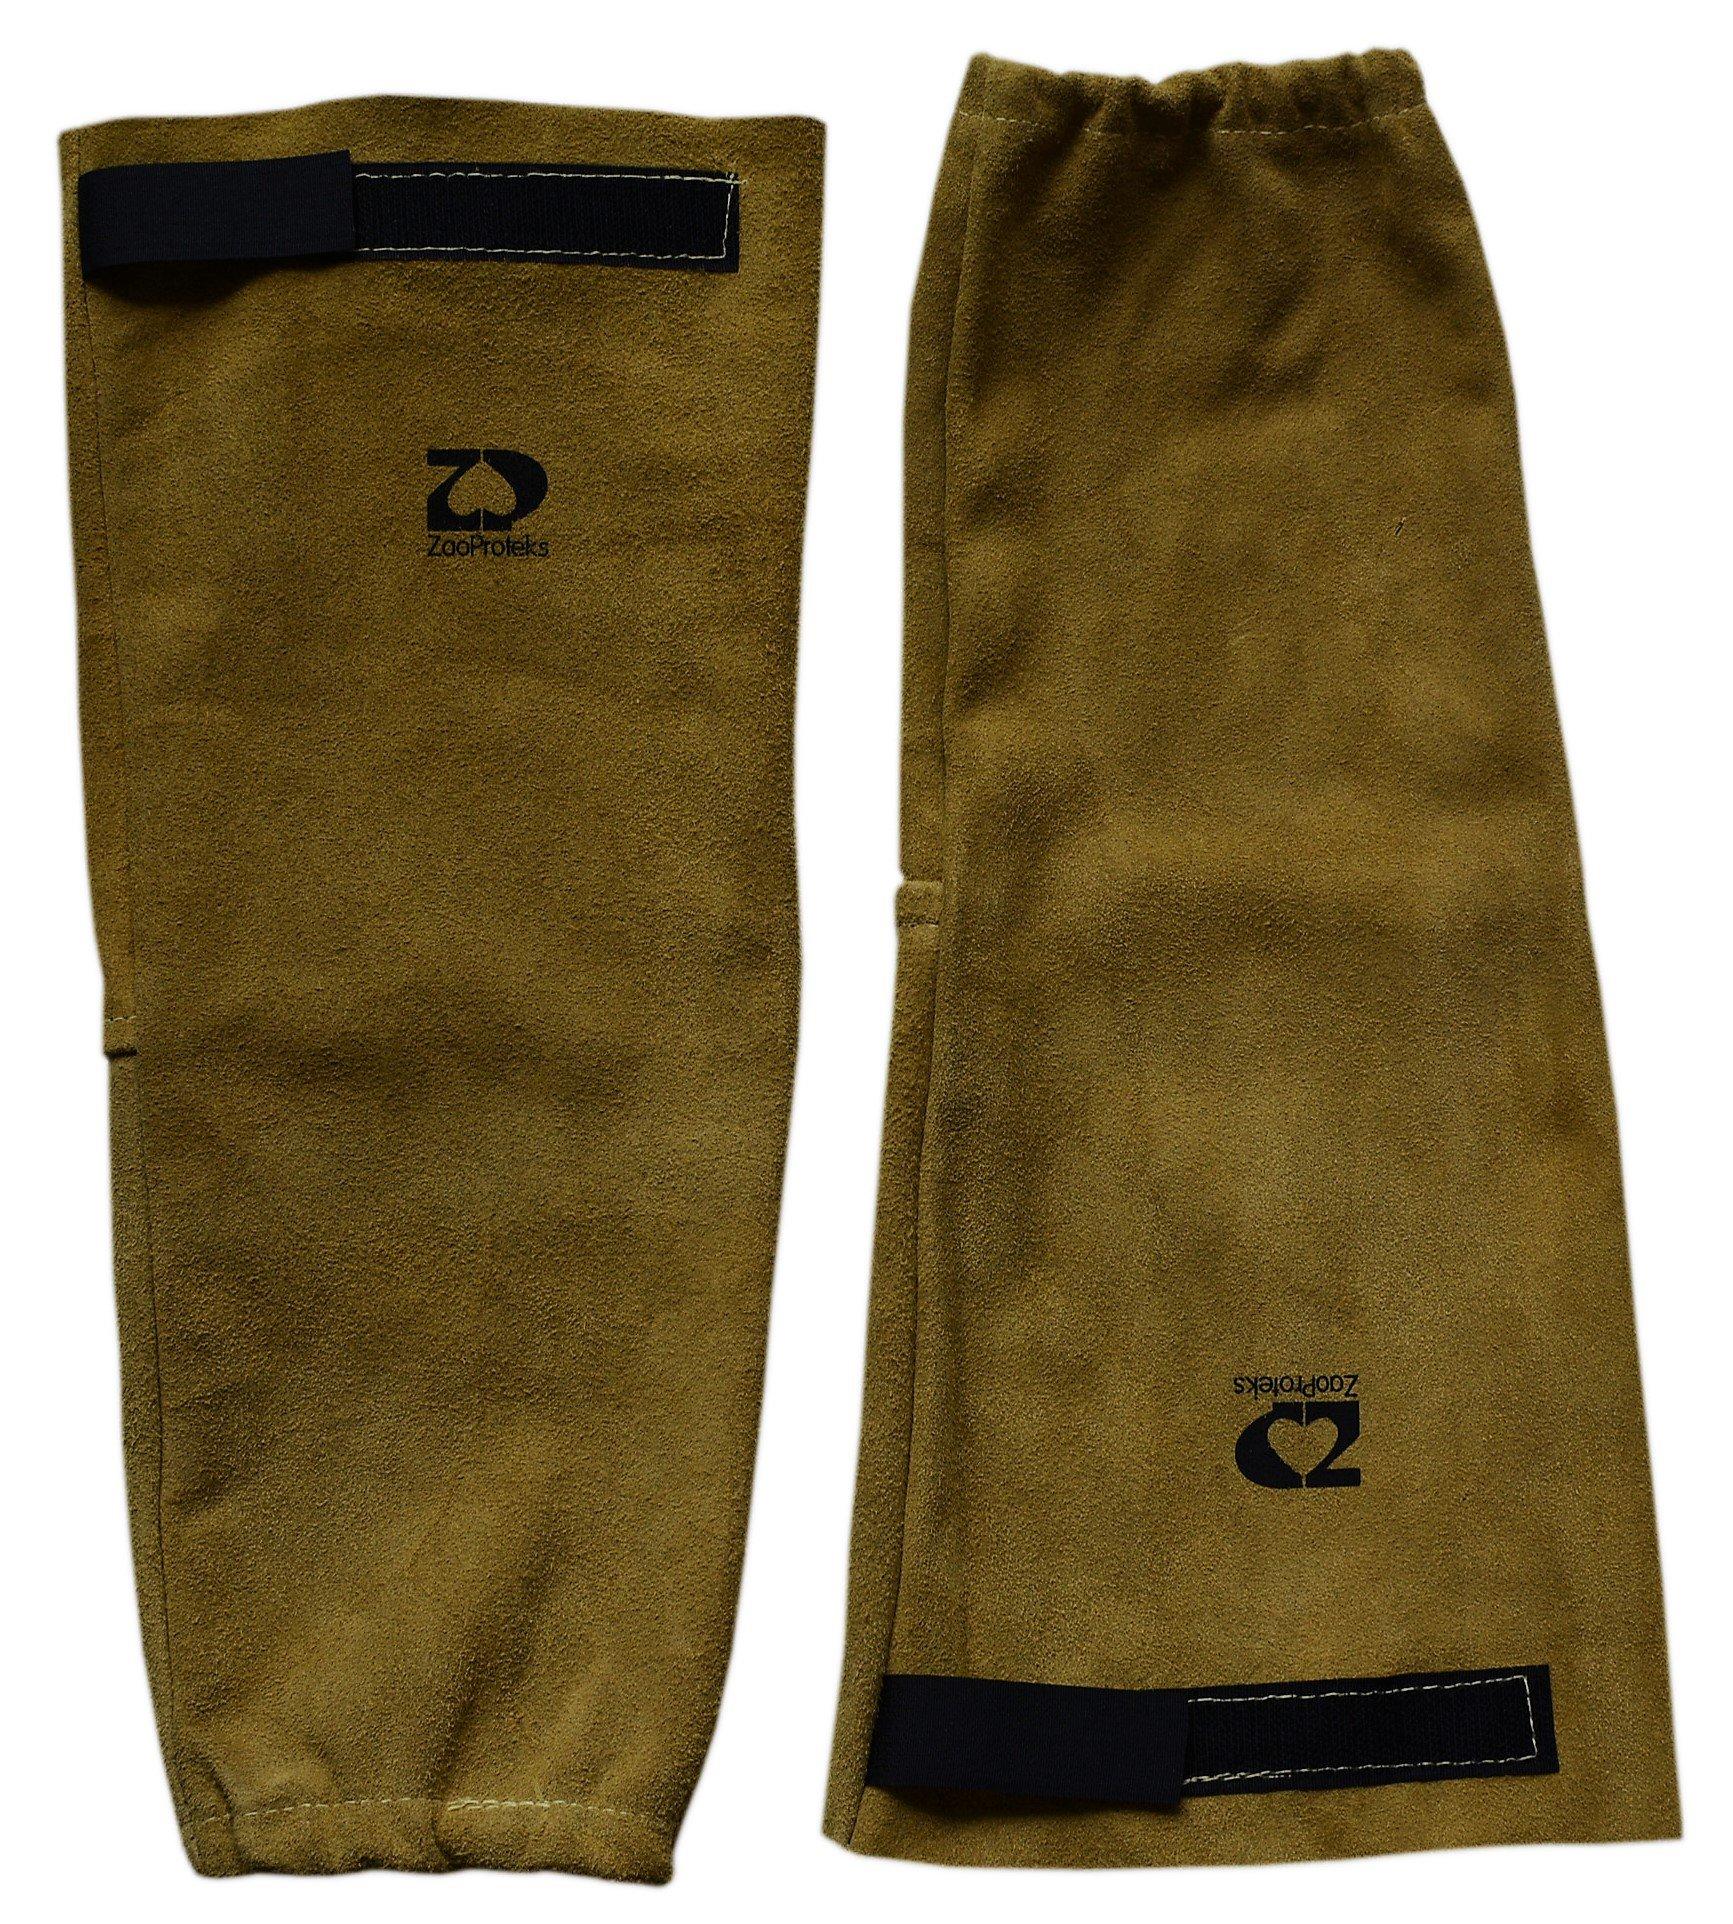 ZaoProteks ZP2202 Heat Resistant Welding Sleeves (Elastic and Velcro Cuff)